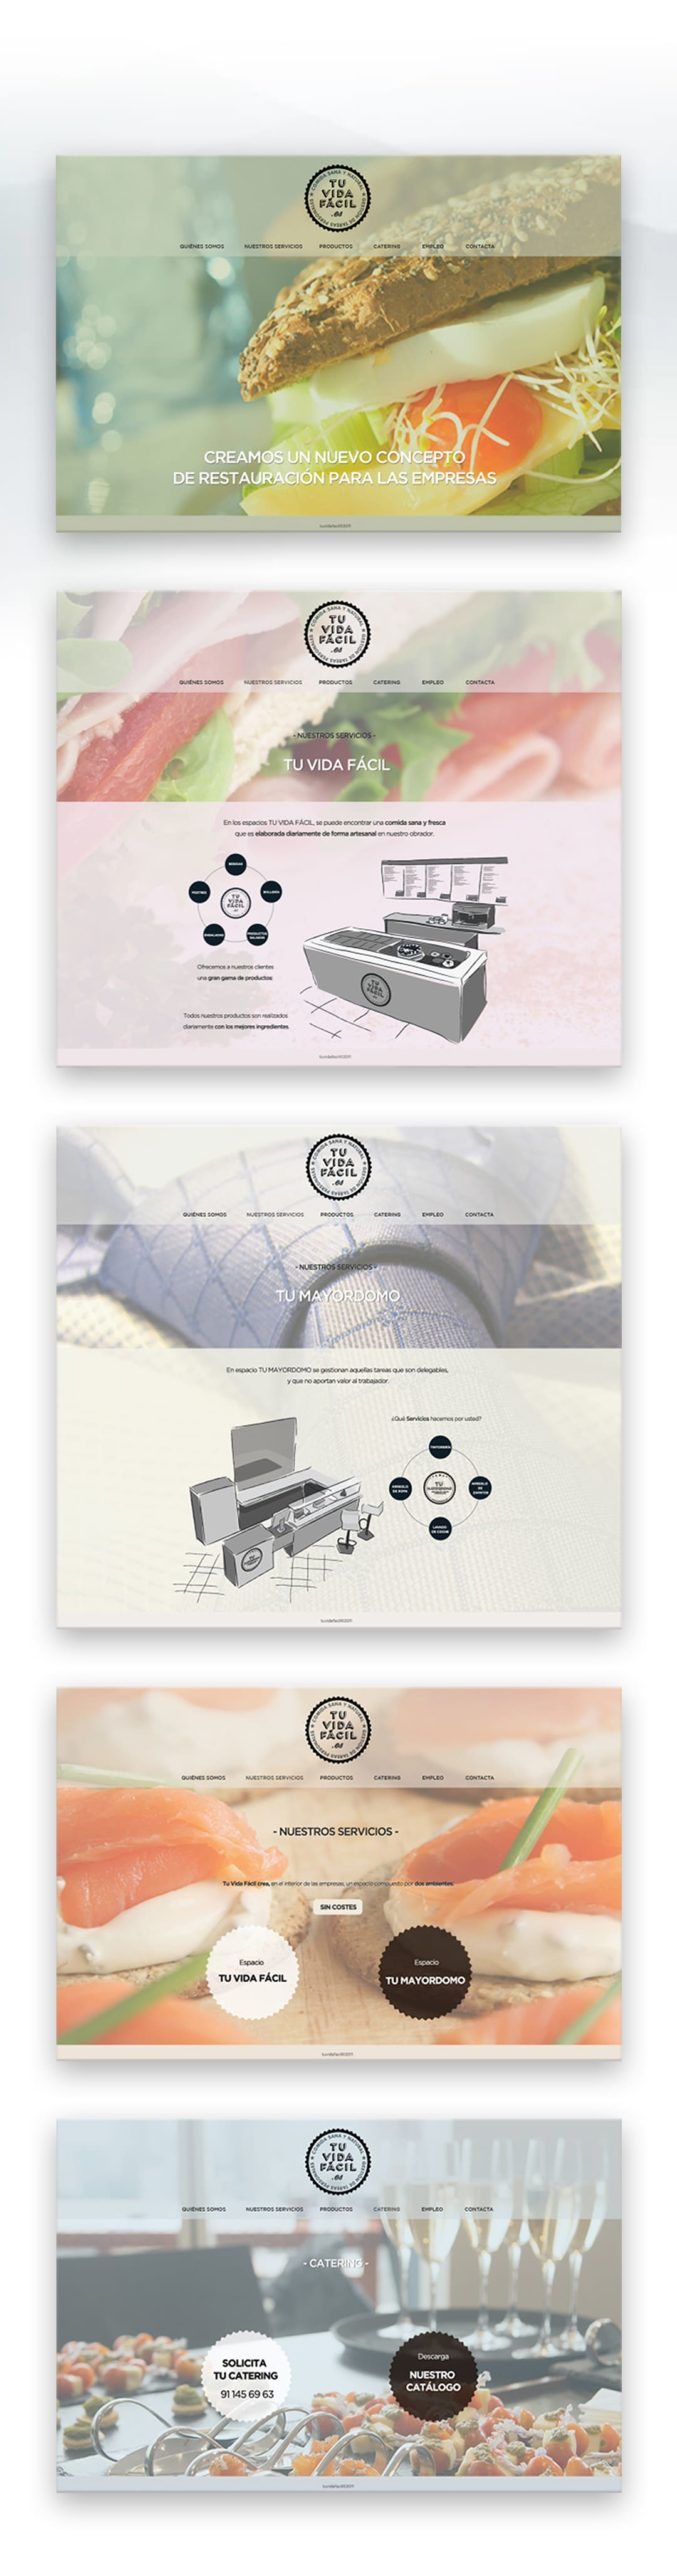 Zona kamaleon - Tu Vida Facil - diseño web